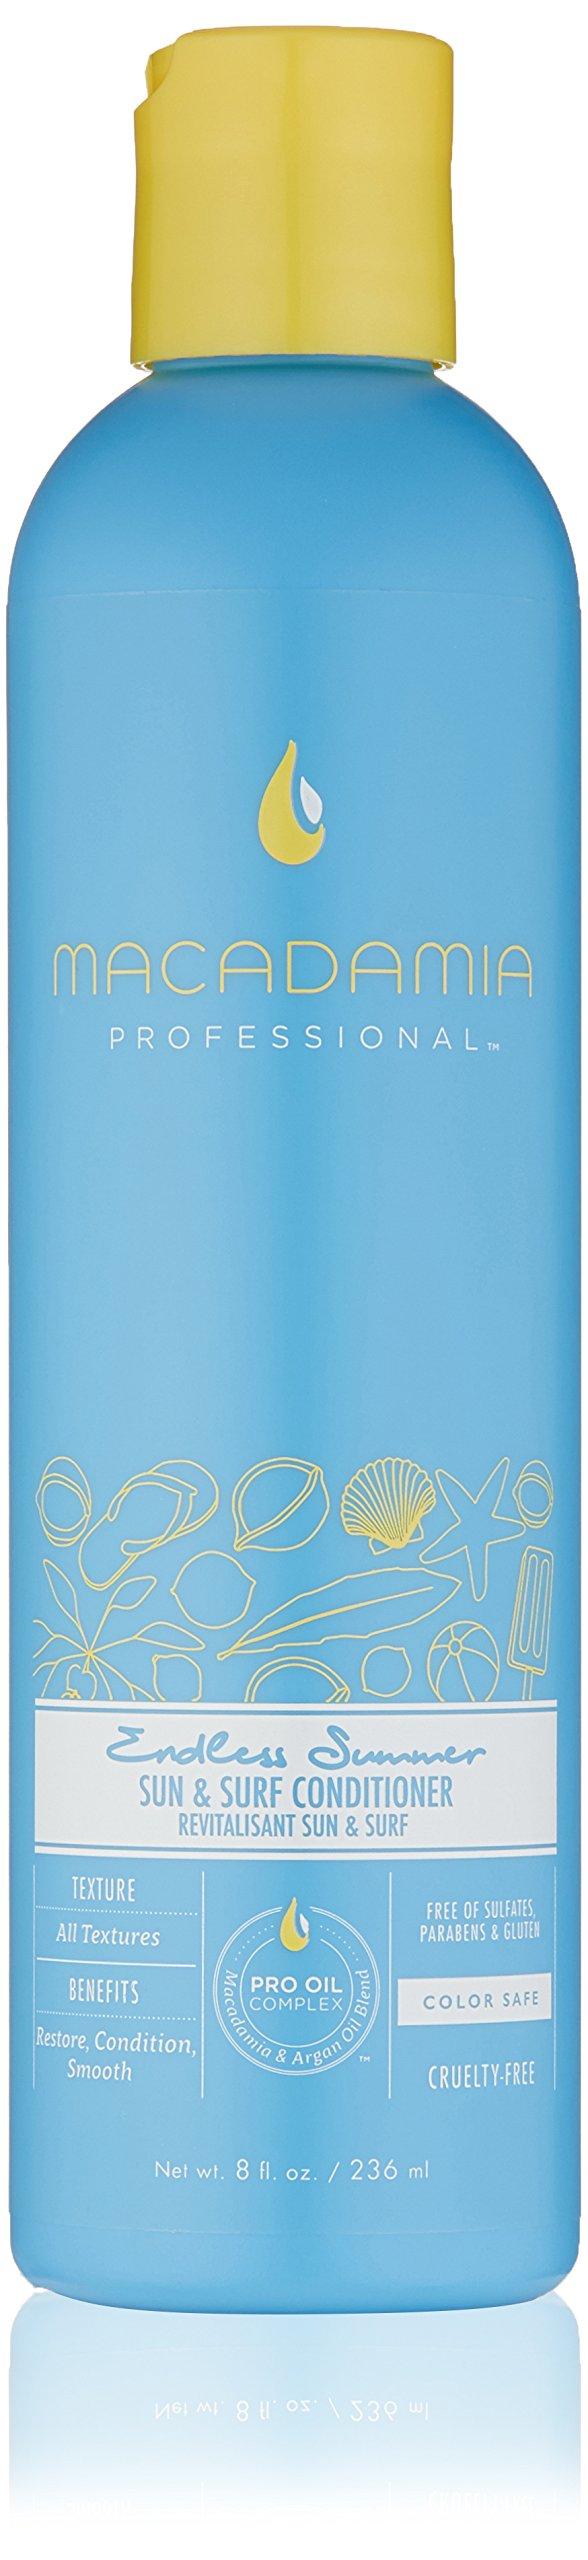 Macadamia Professional Endless Summer Sun & Surf Conditioner, Coconut Cream, 8 fl. oz.